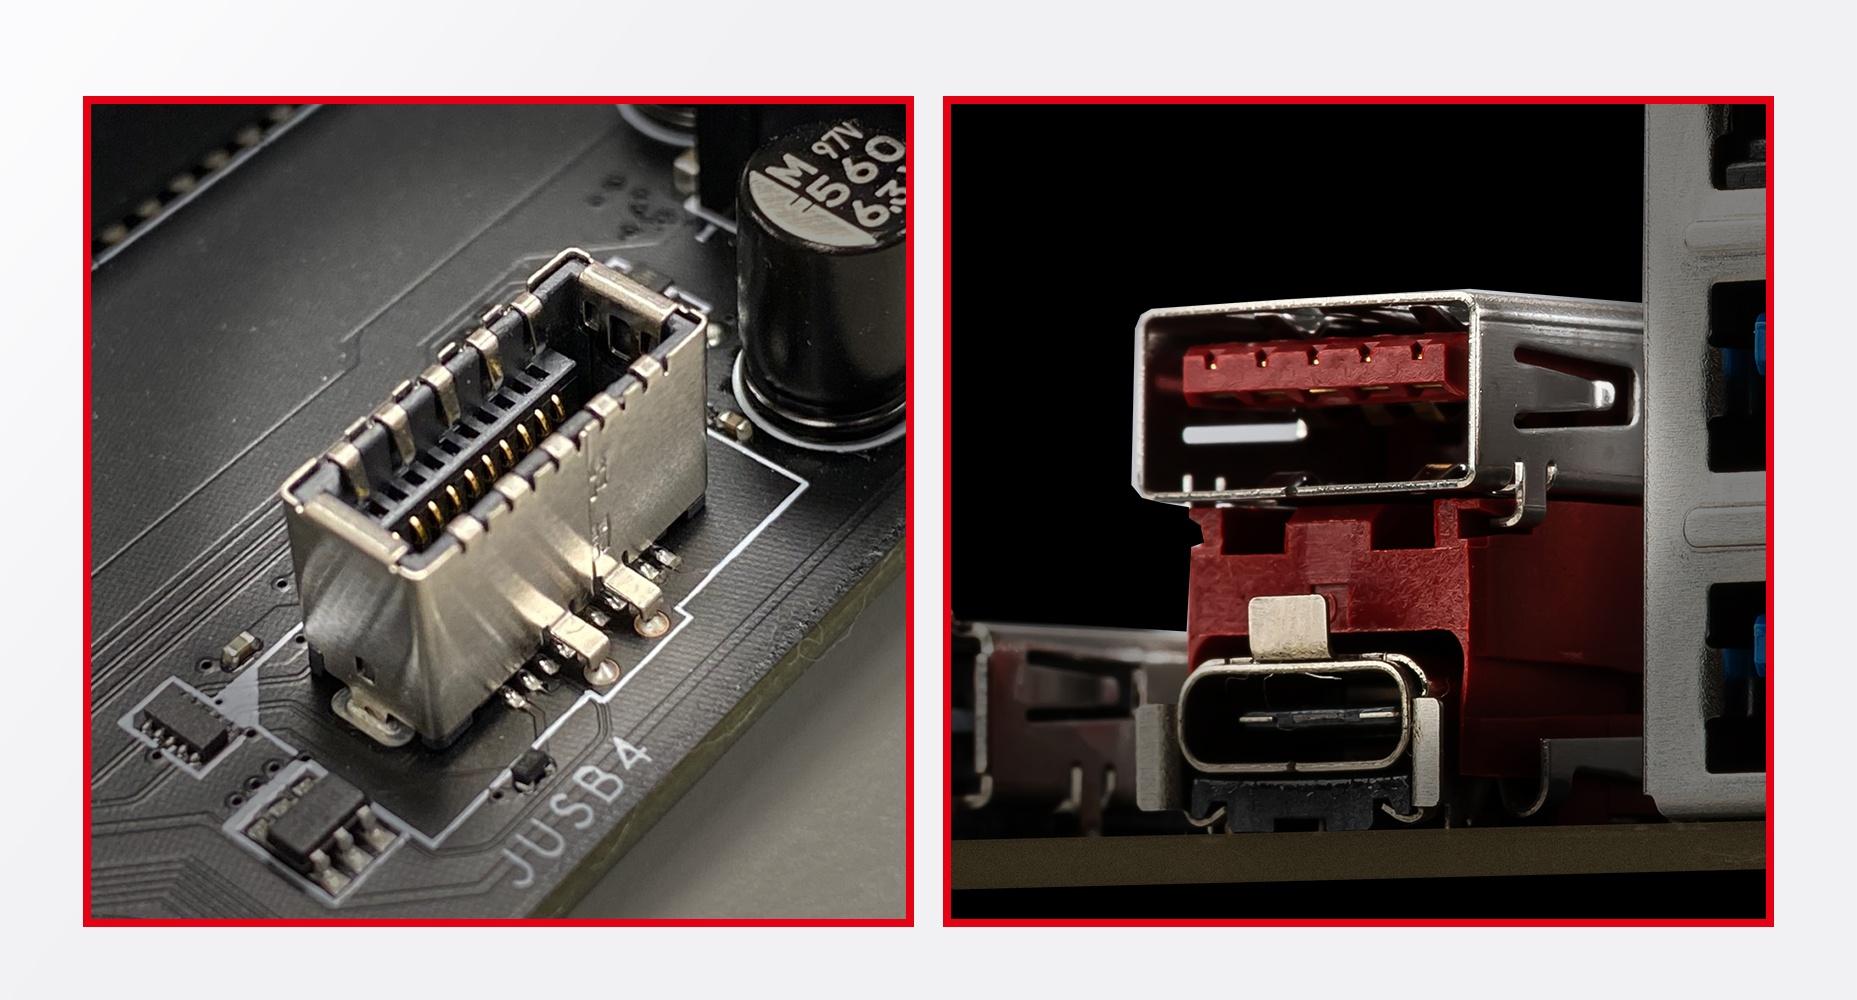 MSI MPG B550I GAMING EDGE WIFI USB Type-C ready in both Front case panel & Rear IO